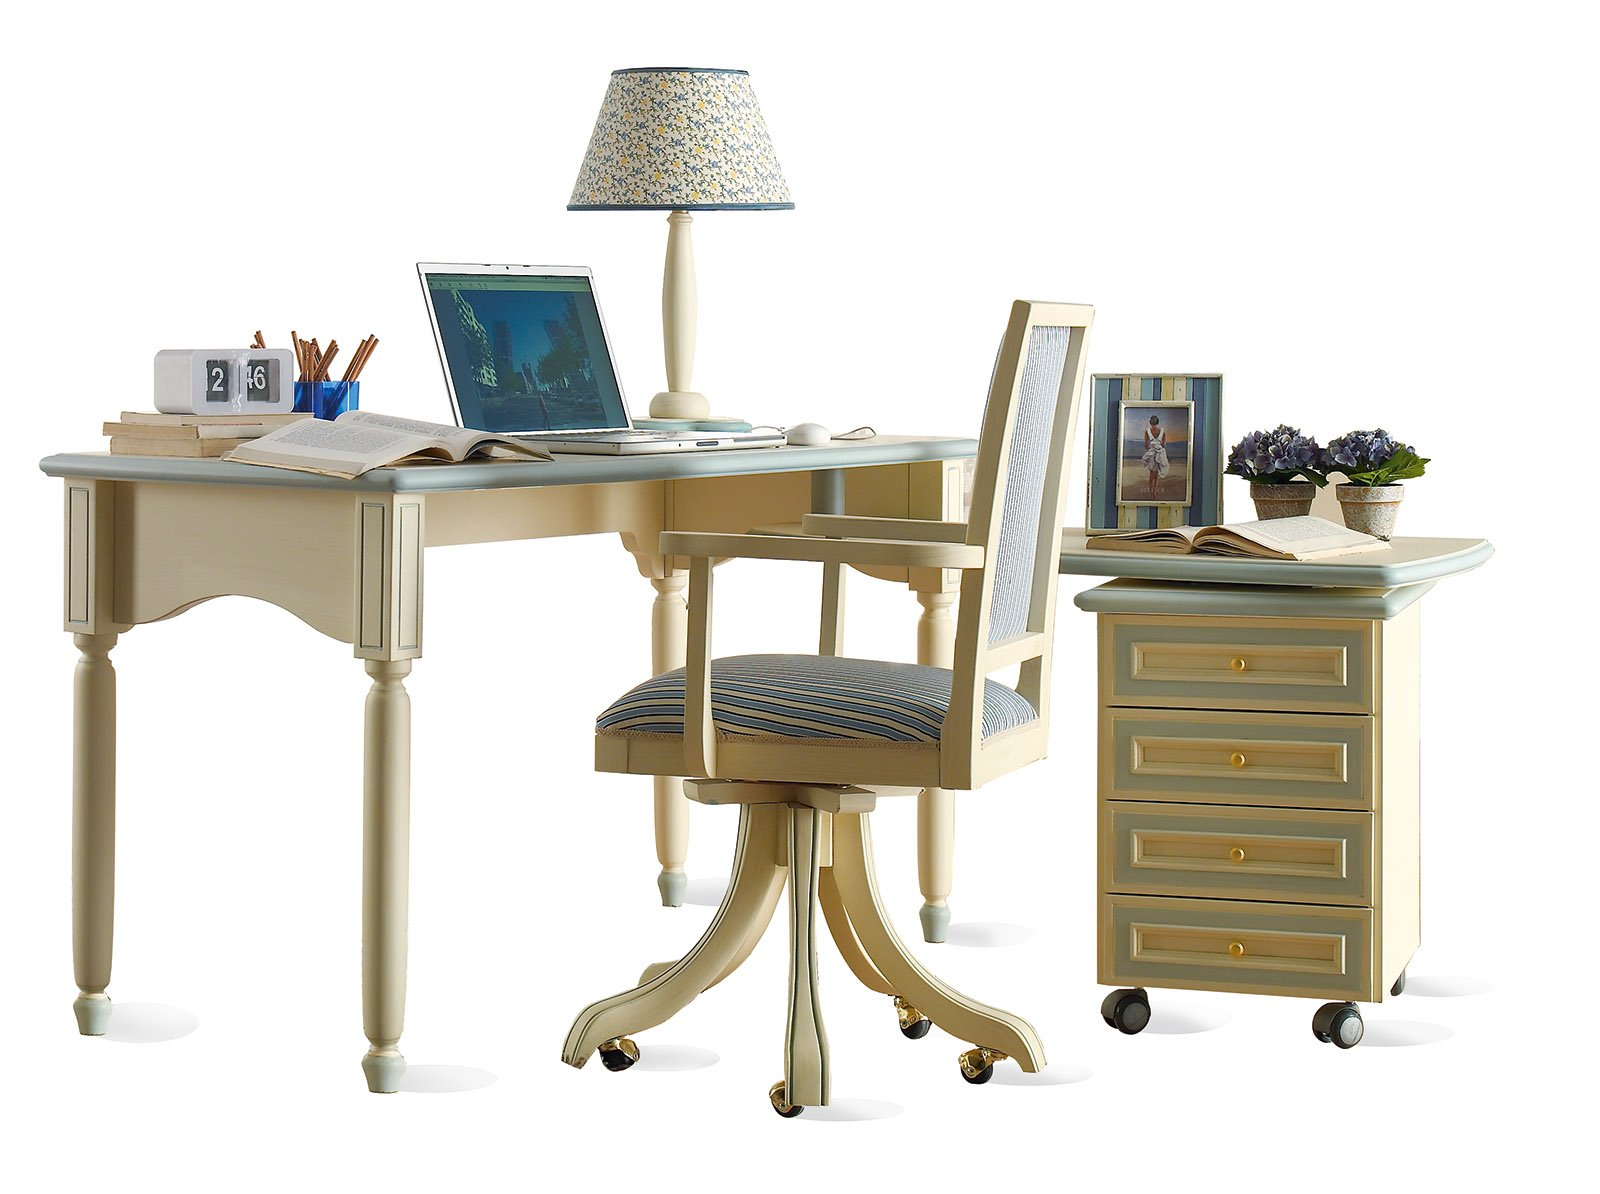 Sedie Imbottite Ikea: Tavolo pieghevole leroy merlin mobili e ...